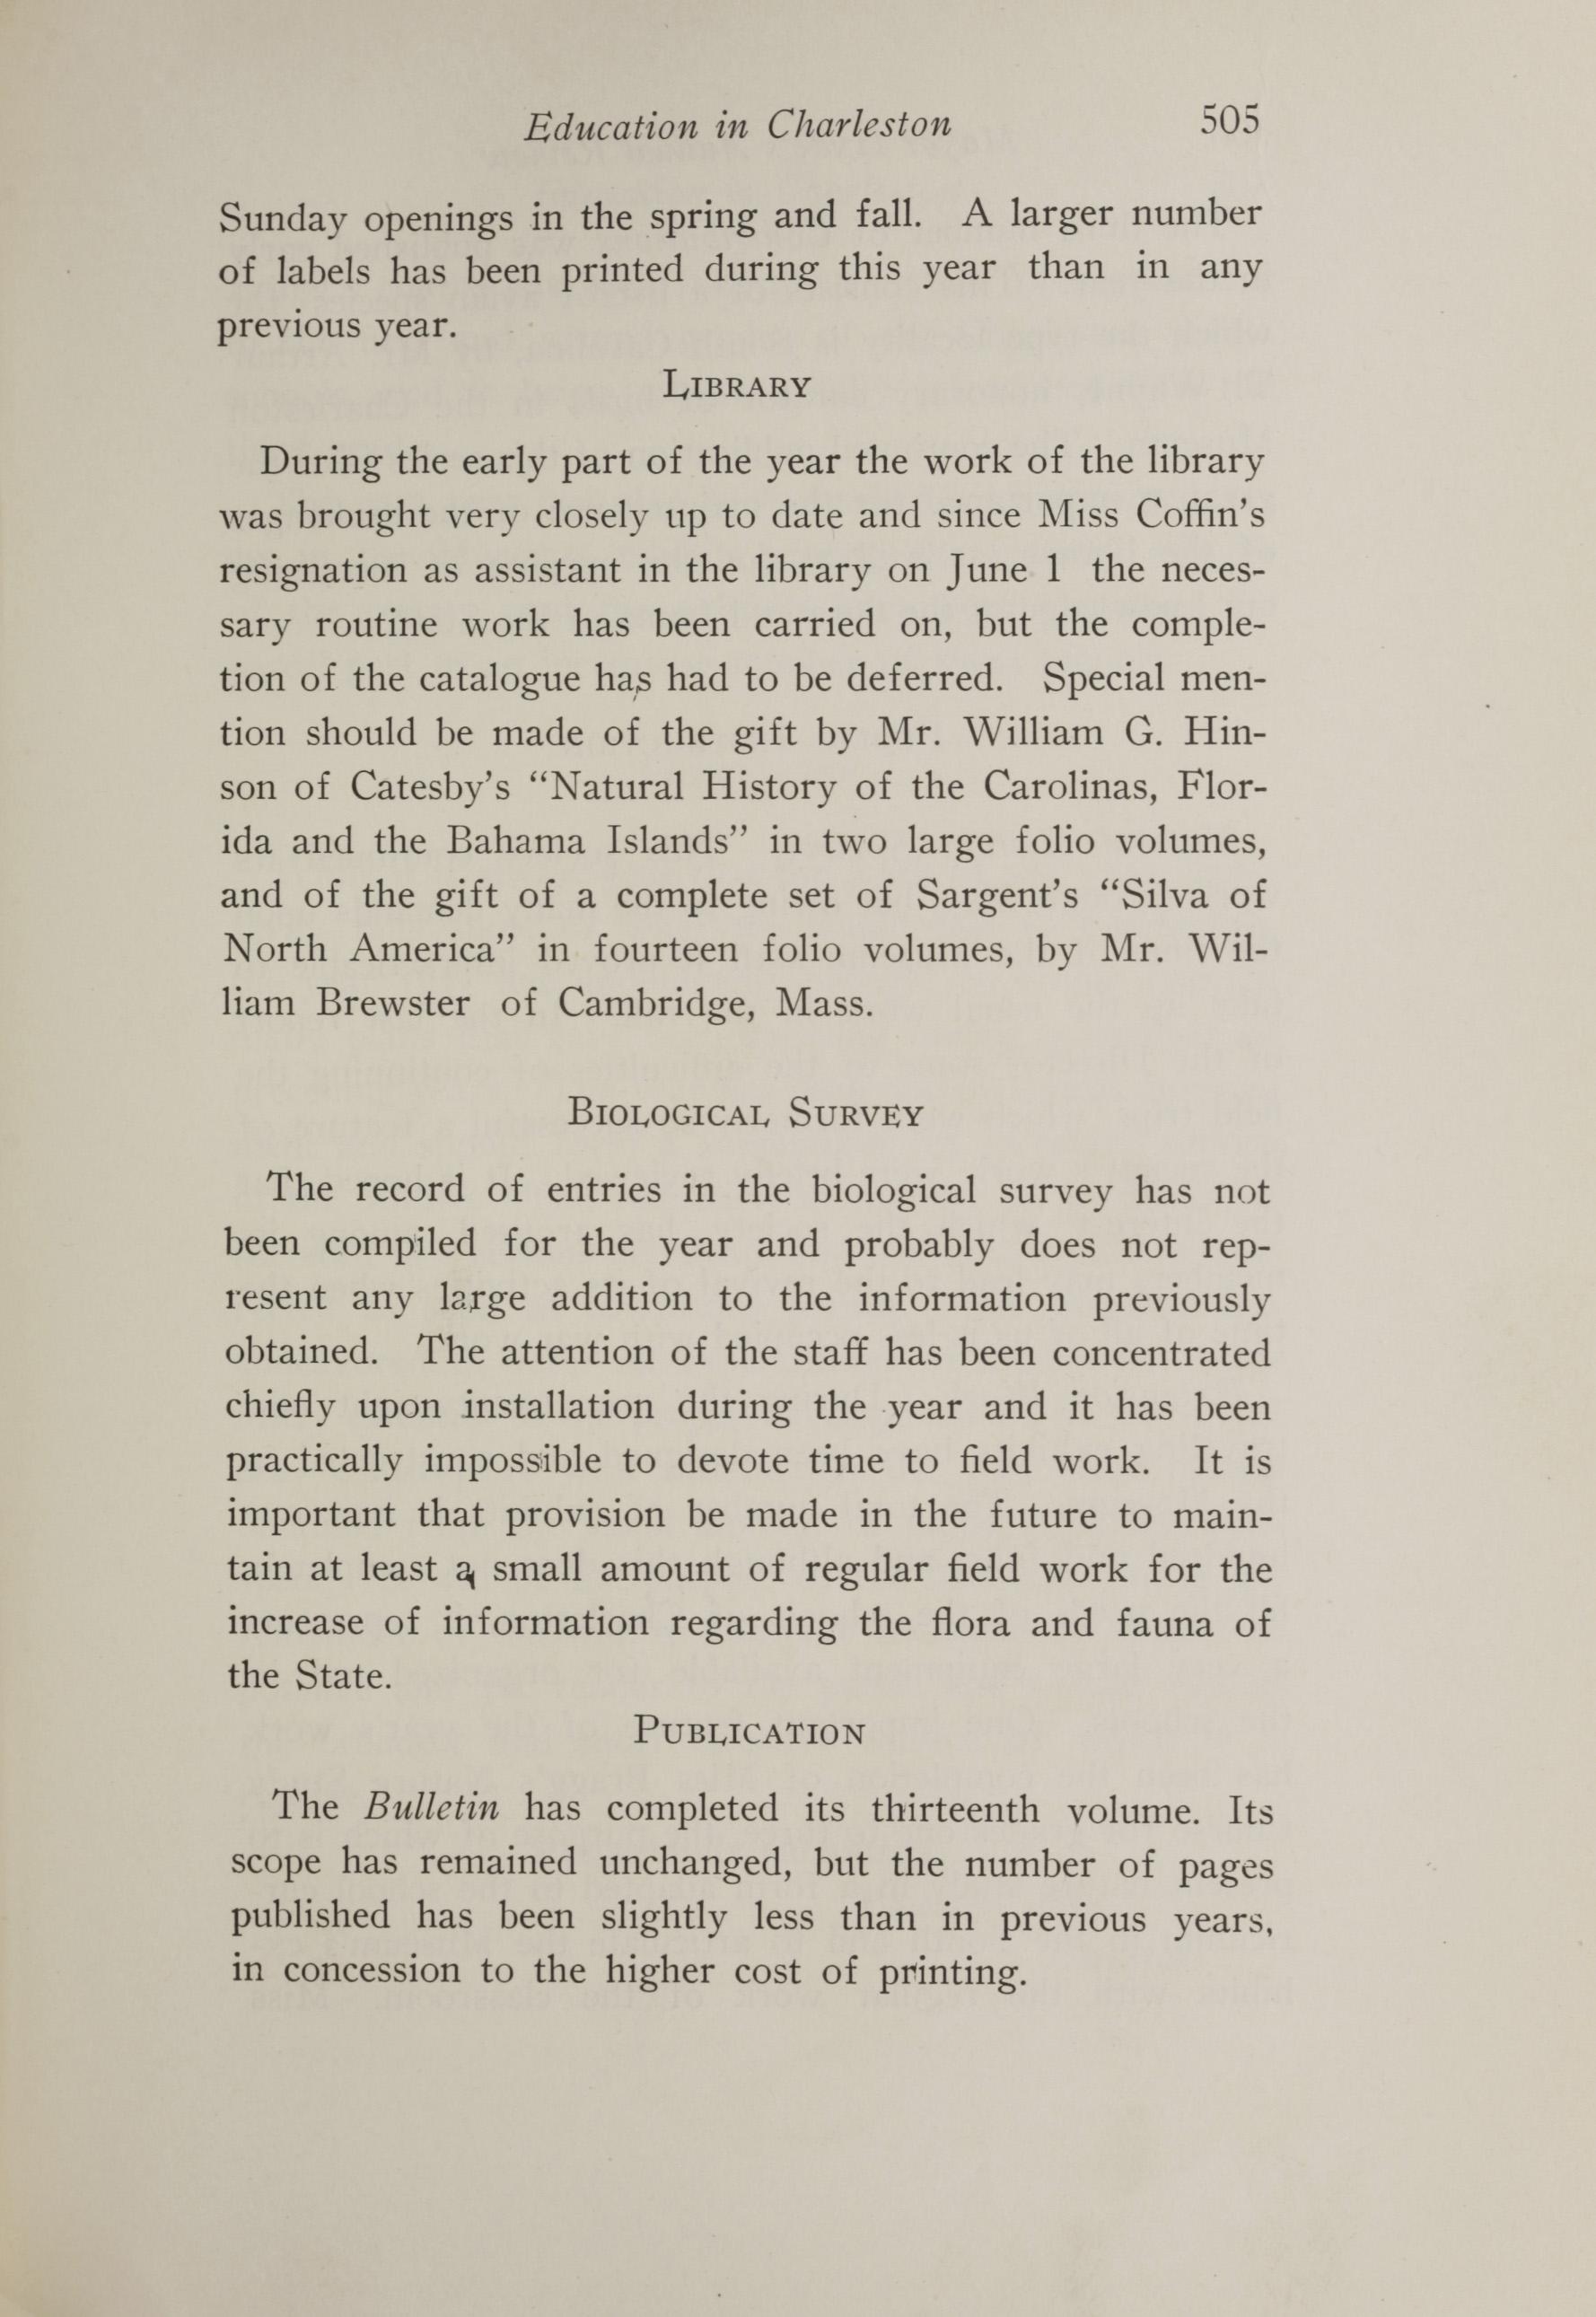 Charleston Yearbook, 1917, page 505